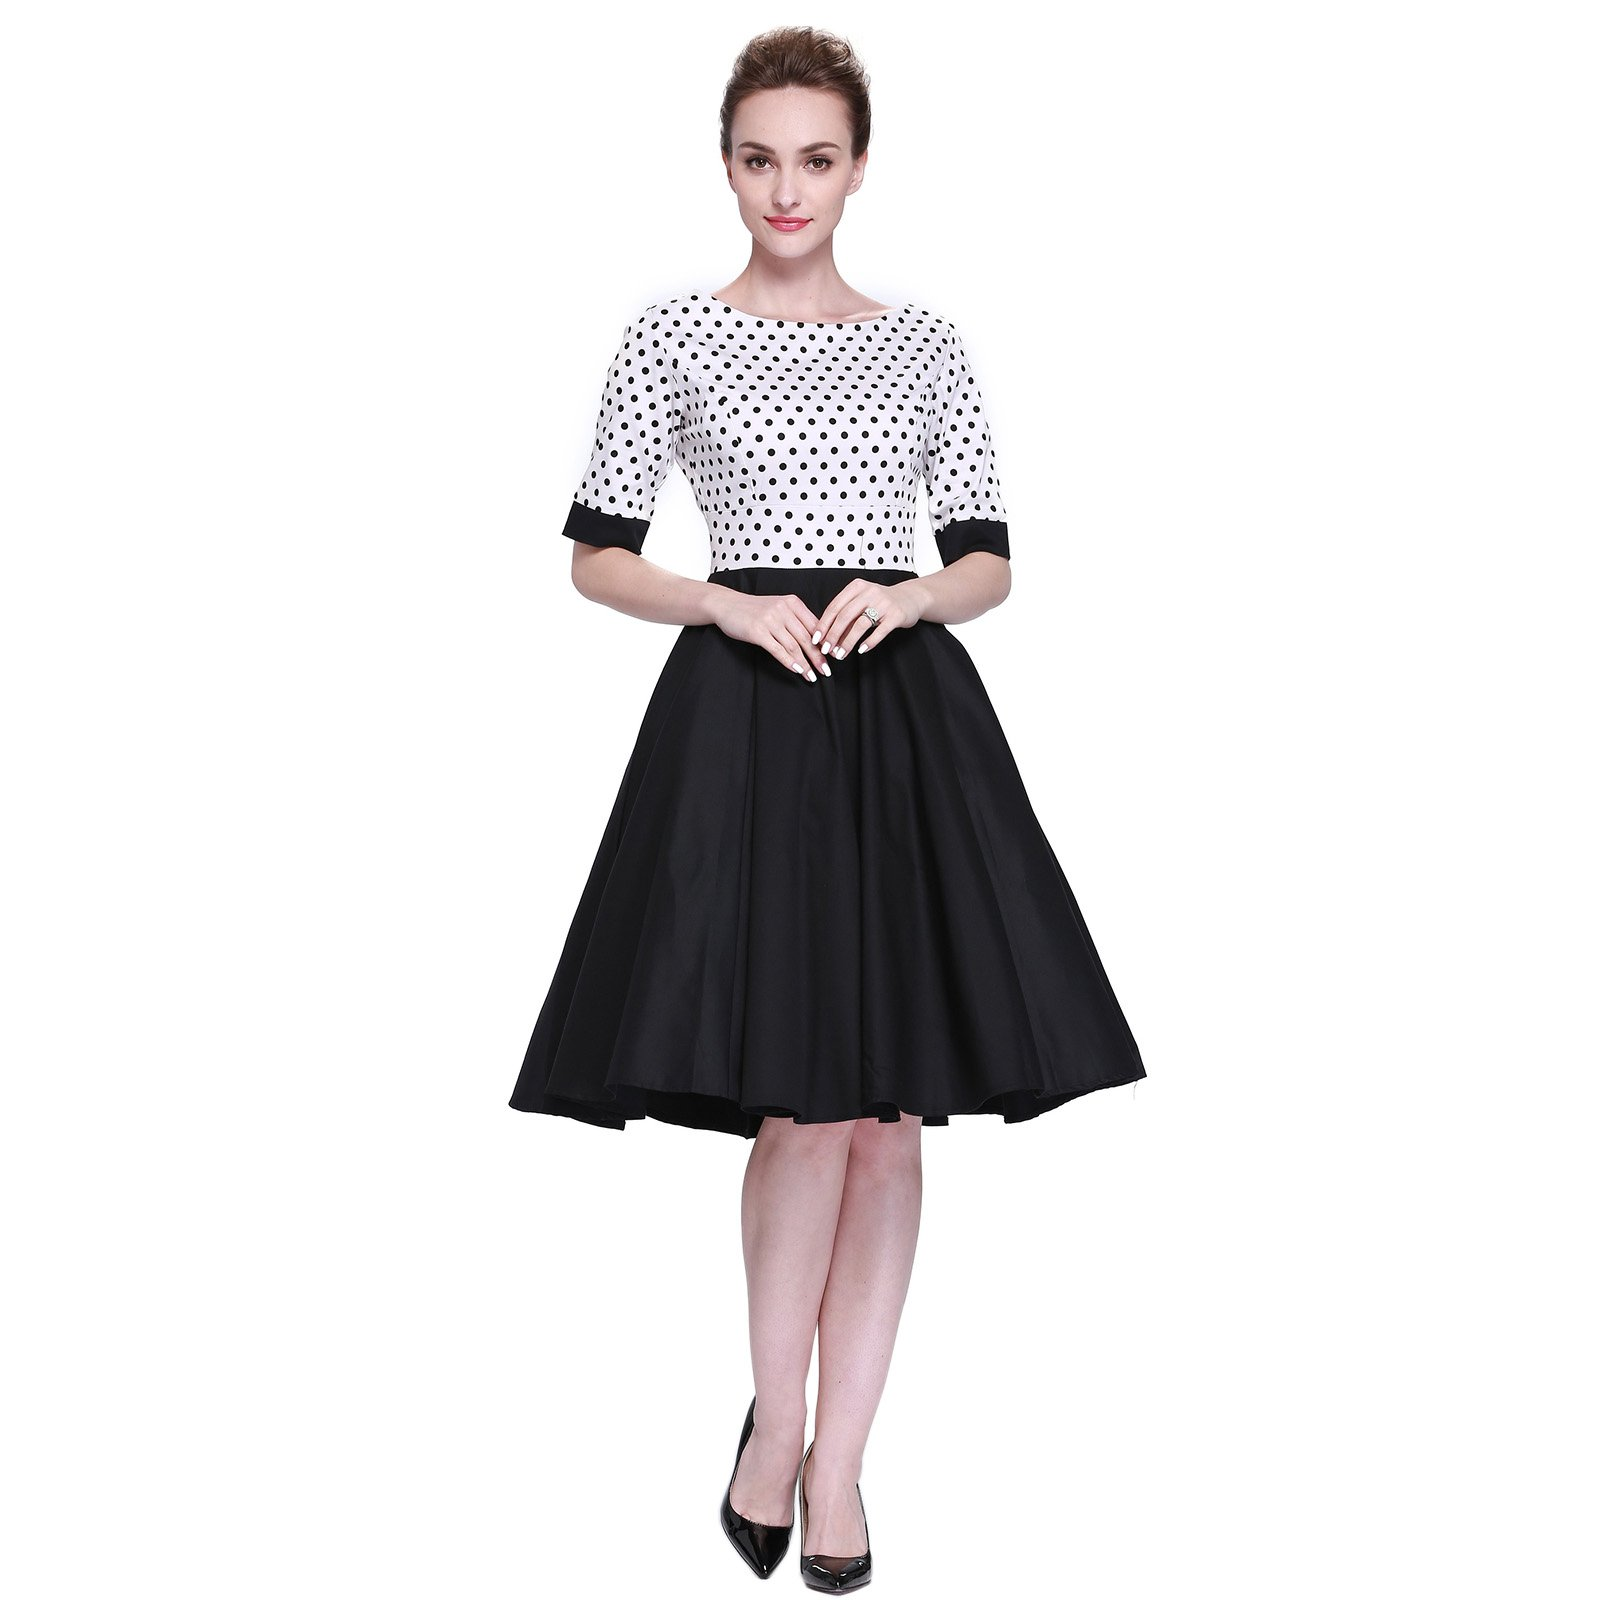 Heroecol Vintage 1950s 50s Dress Style Retro Rockabiily Cocktail M WBDBK